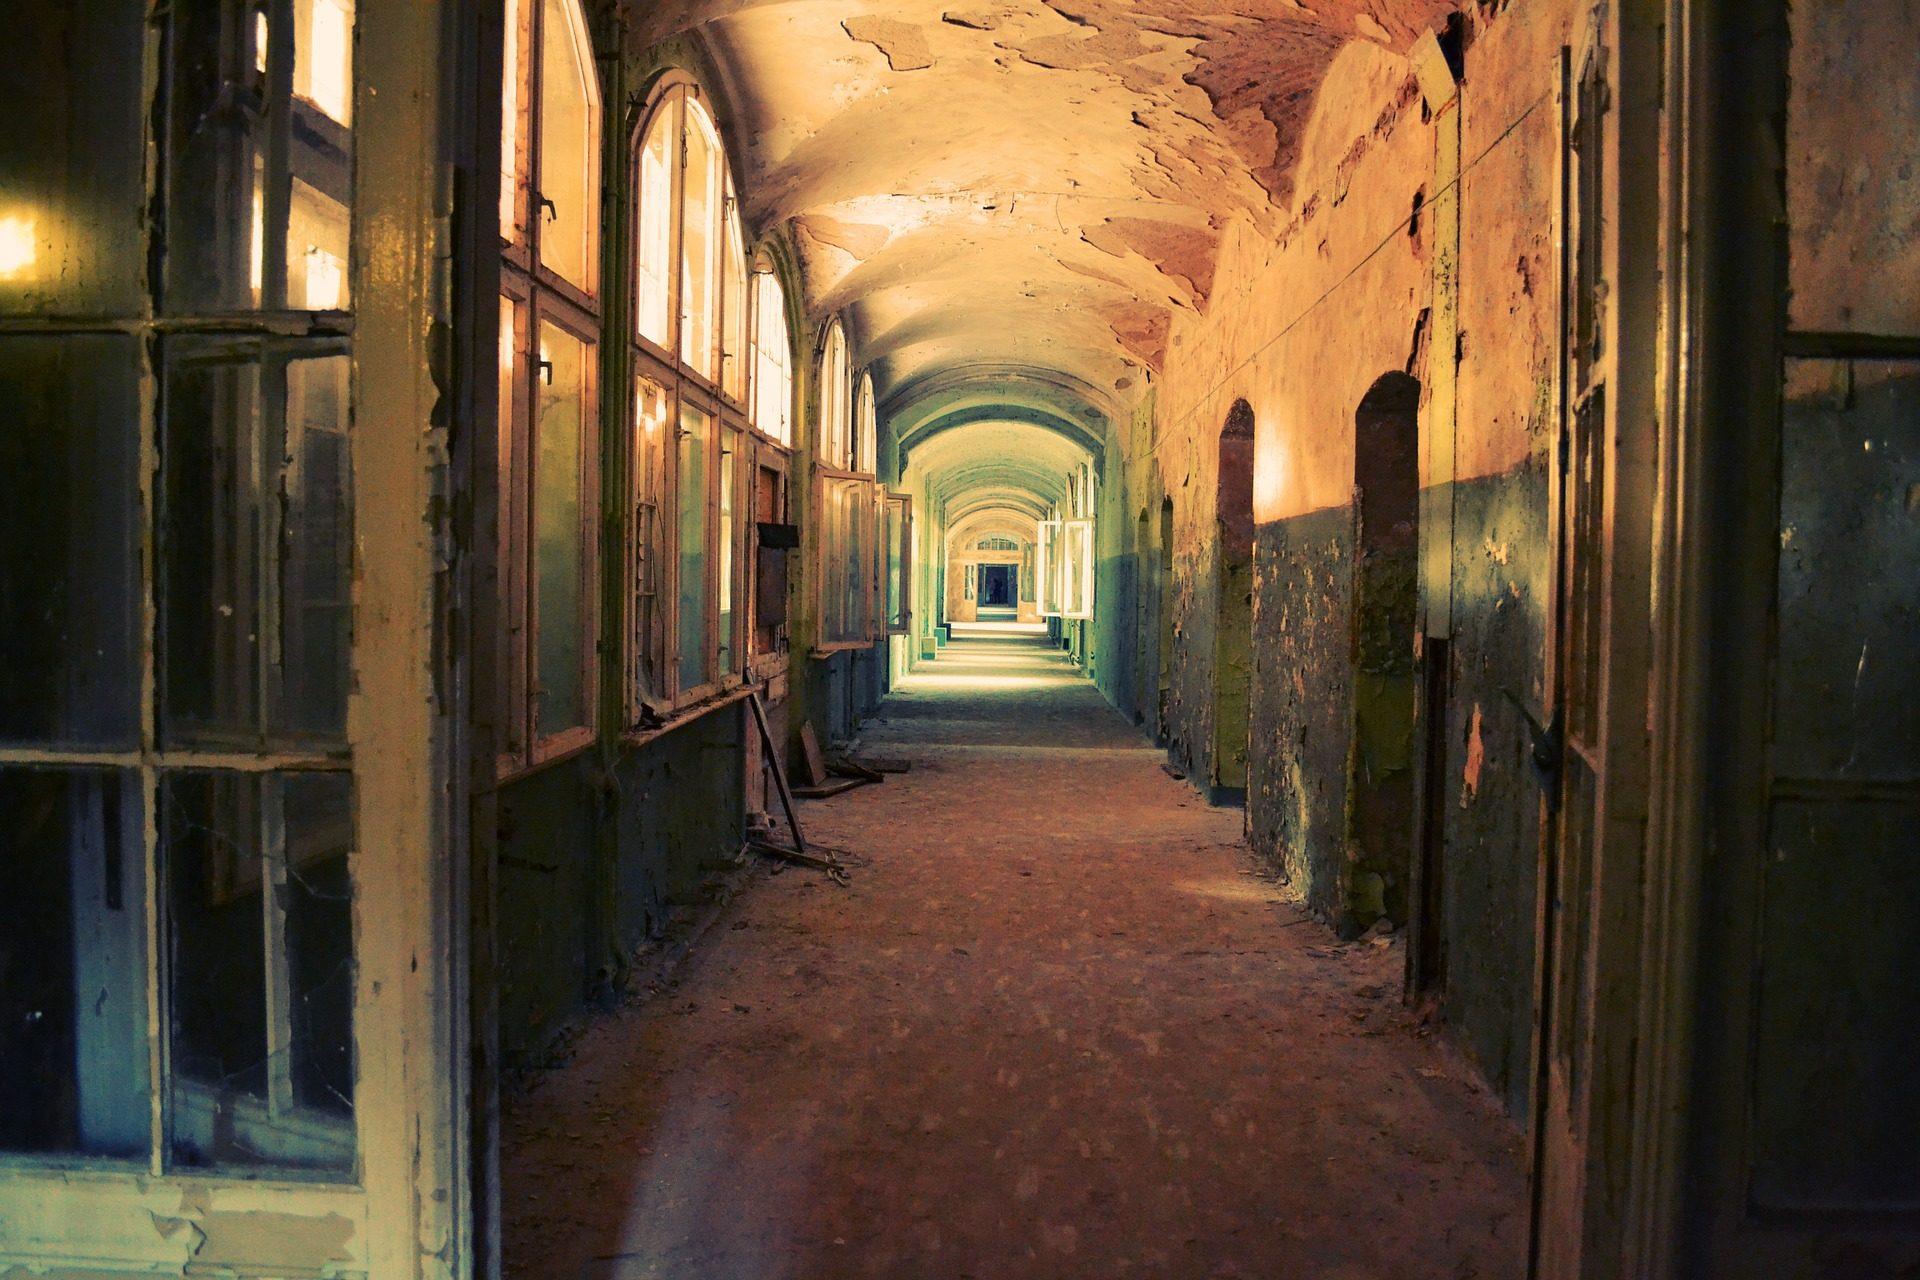 pasillo, ホール, ドア, 建物, 放棄, 古い - HD の壁紙 - 教授-falken.com